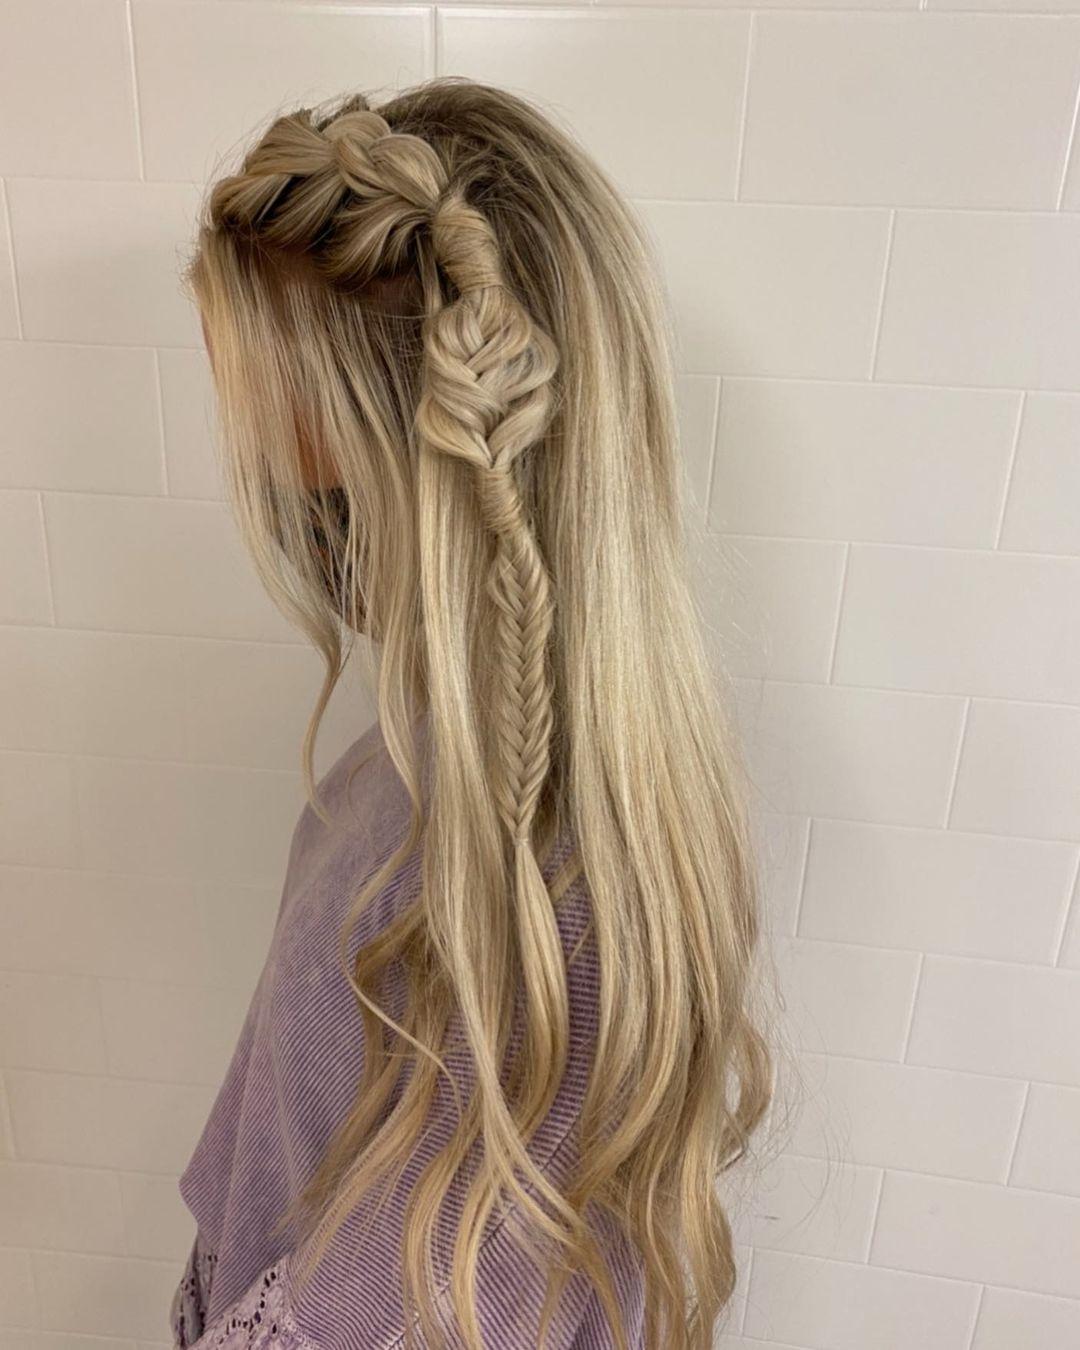 Whimsical braid